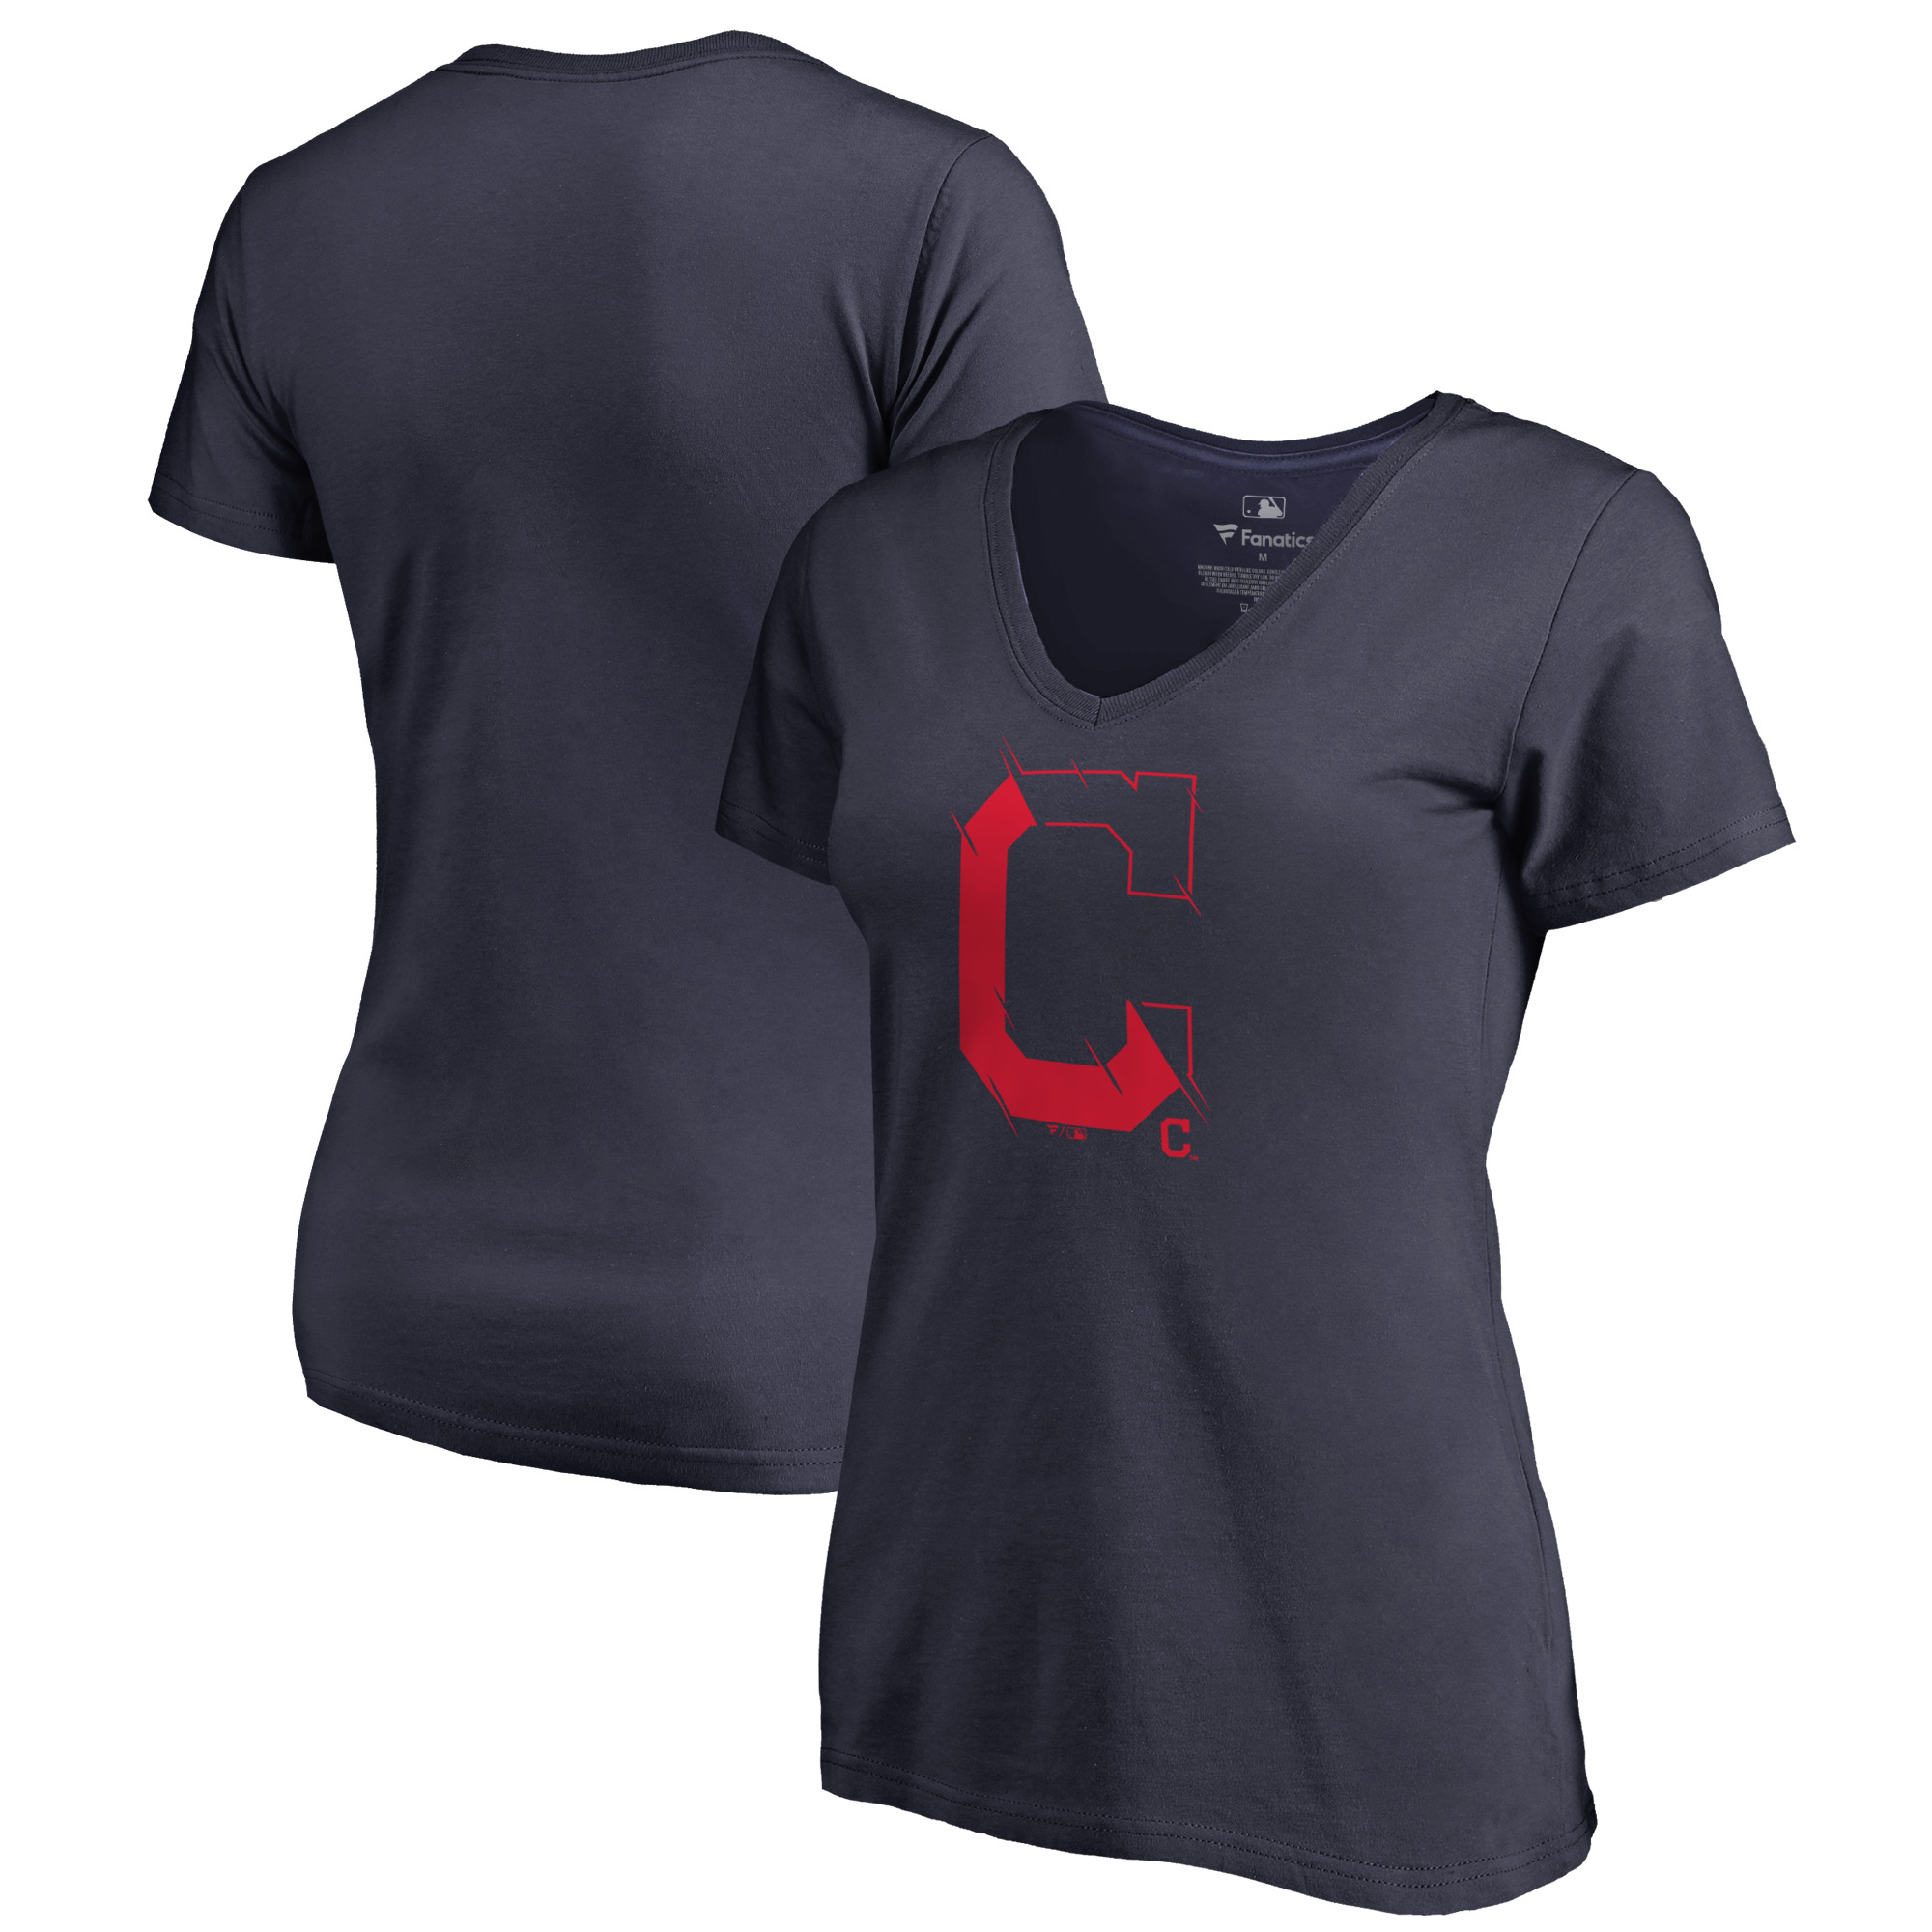 Cleveland Indians Fanatics Branded Women's X-Ray Plus Size V-Neck T-Shirt - Navy